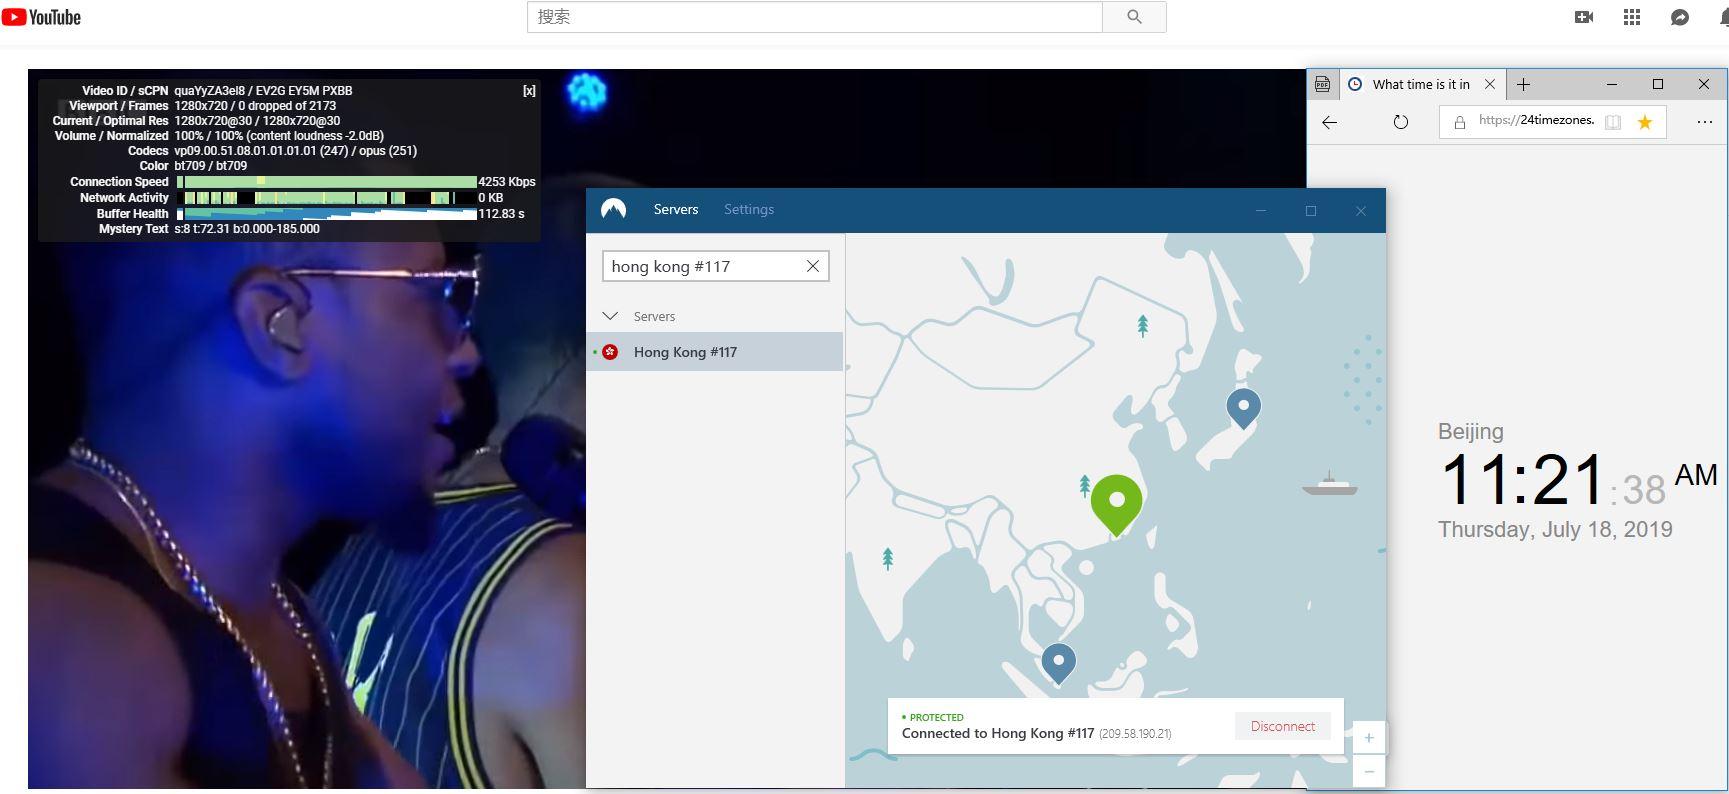 NordVPN Windows 翻墙 科学上午 香港-117服务器 YouTube速度测试-20190718